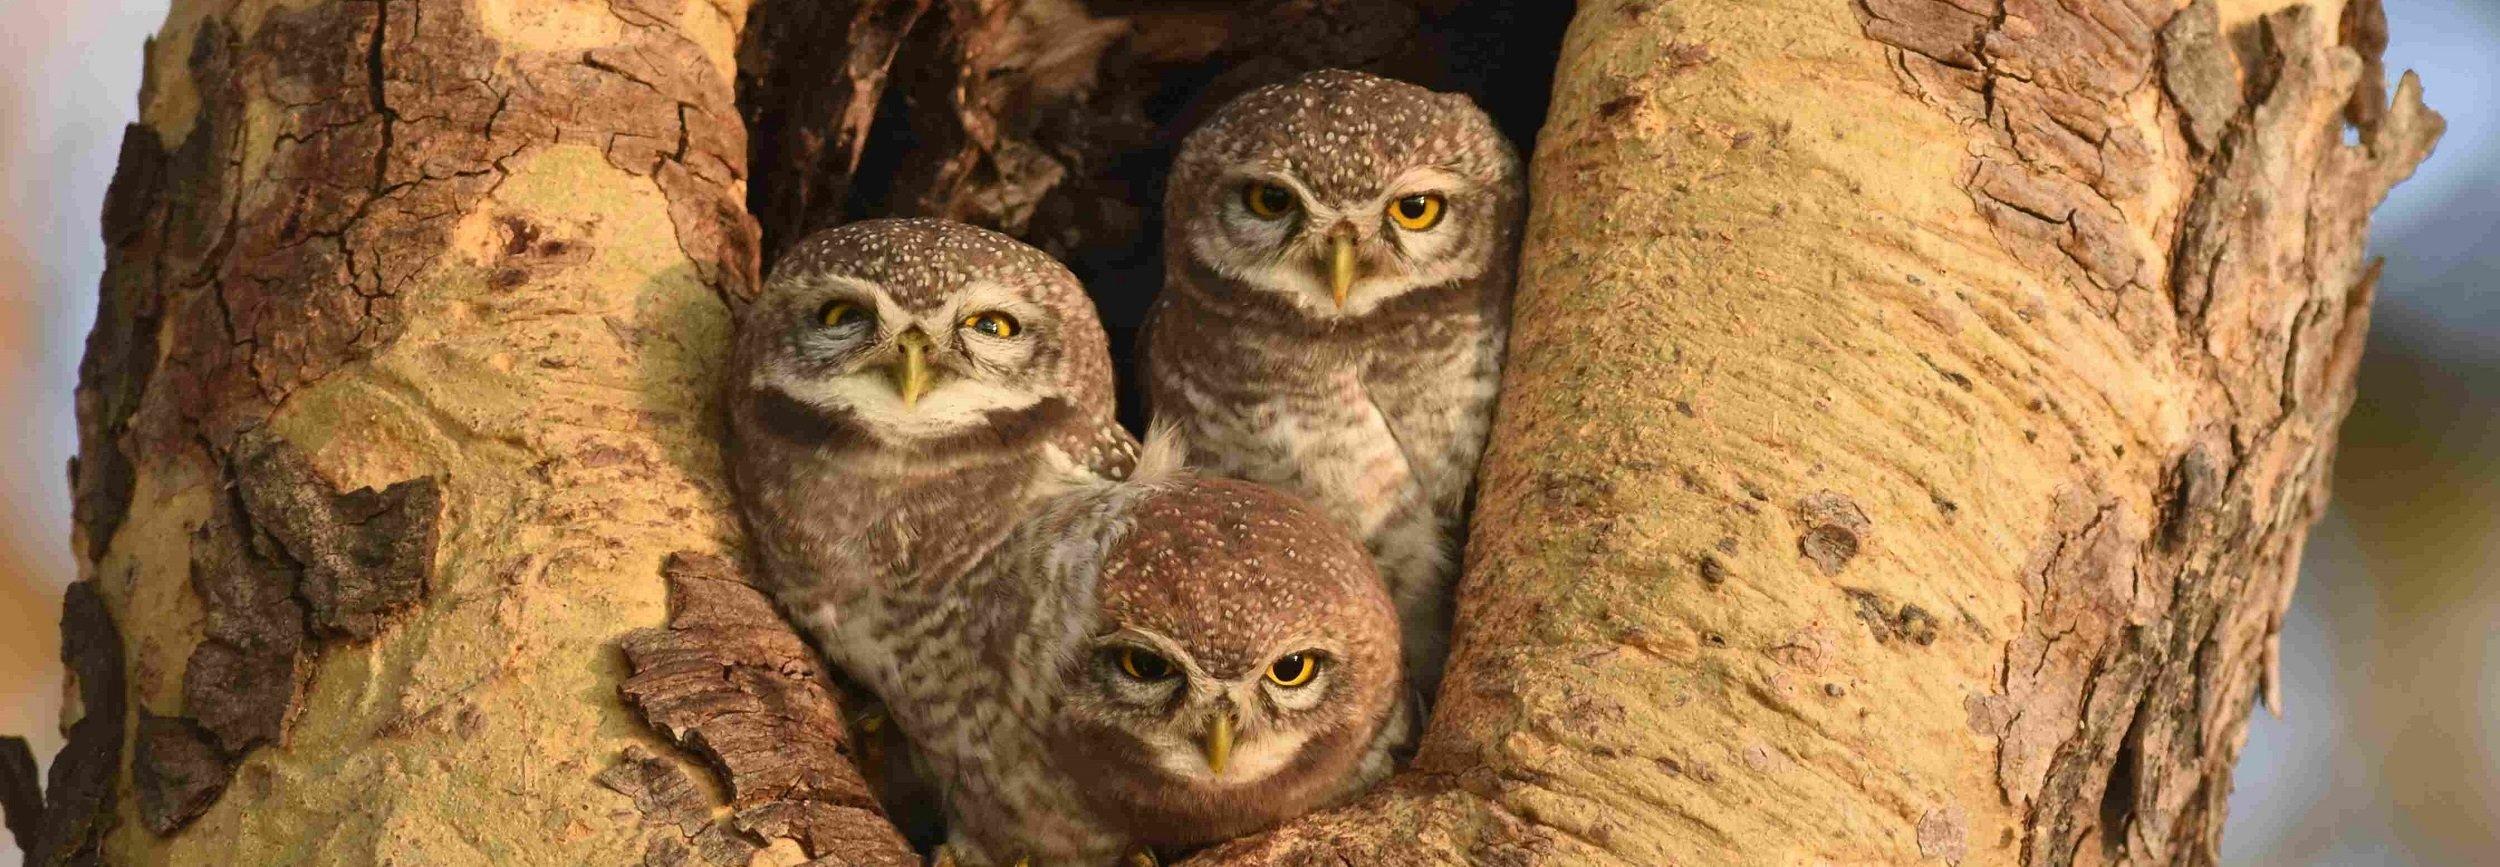 Spotted Owlet, Bagan, Myanmar, 2017, Laurens Steijn